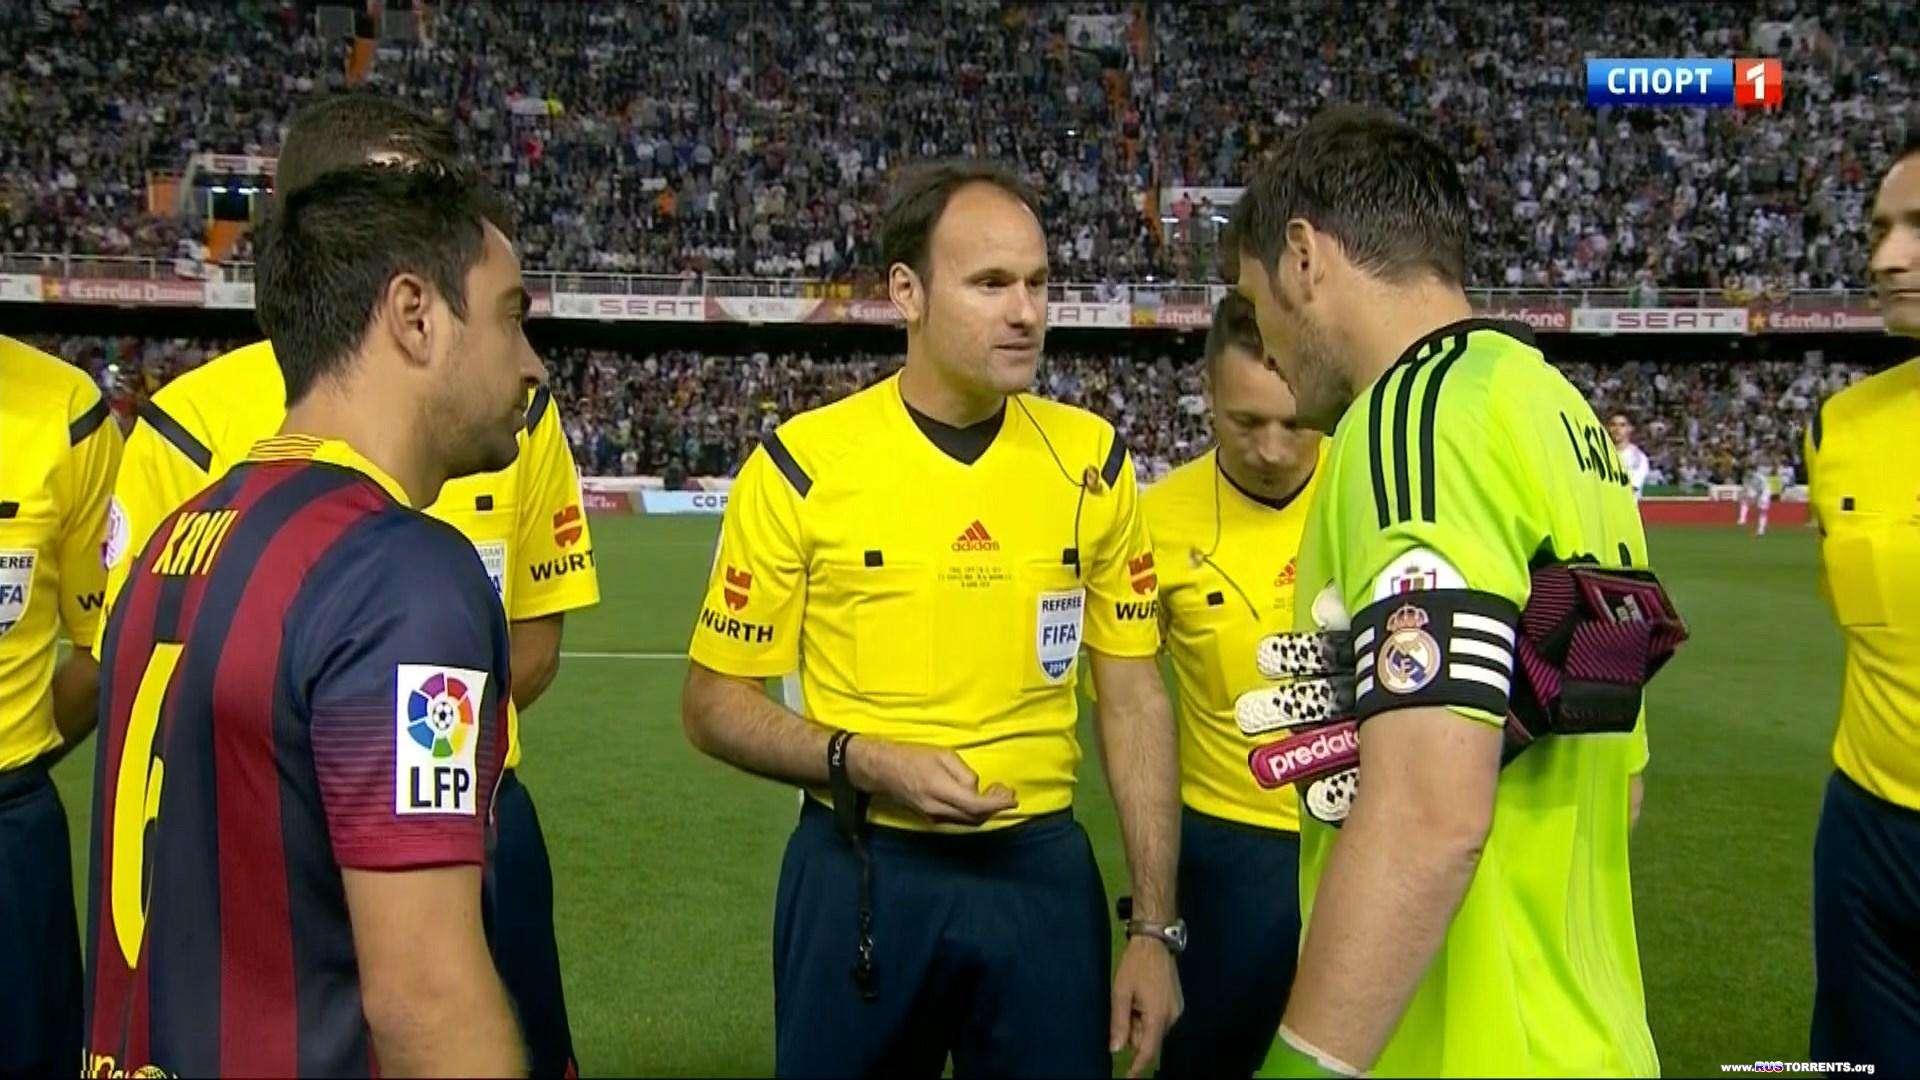 Футбол. Кубок Испании 2013-14. Финал. Барселона - Реал Мадрид | HDTV 1080i